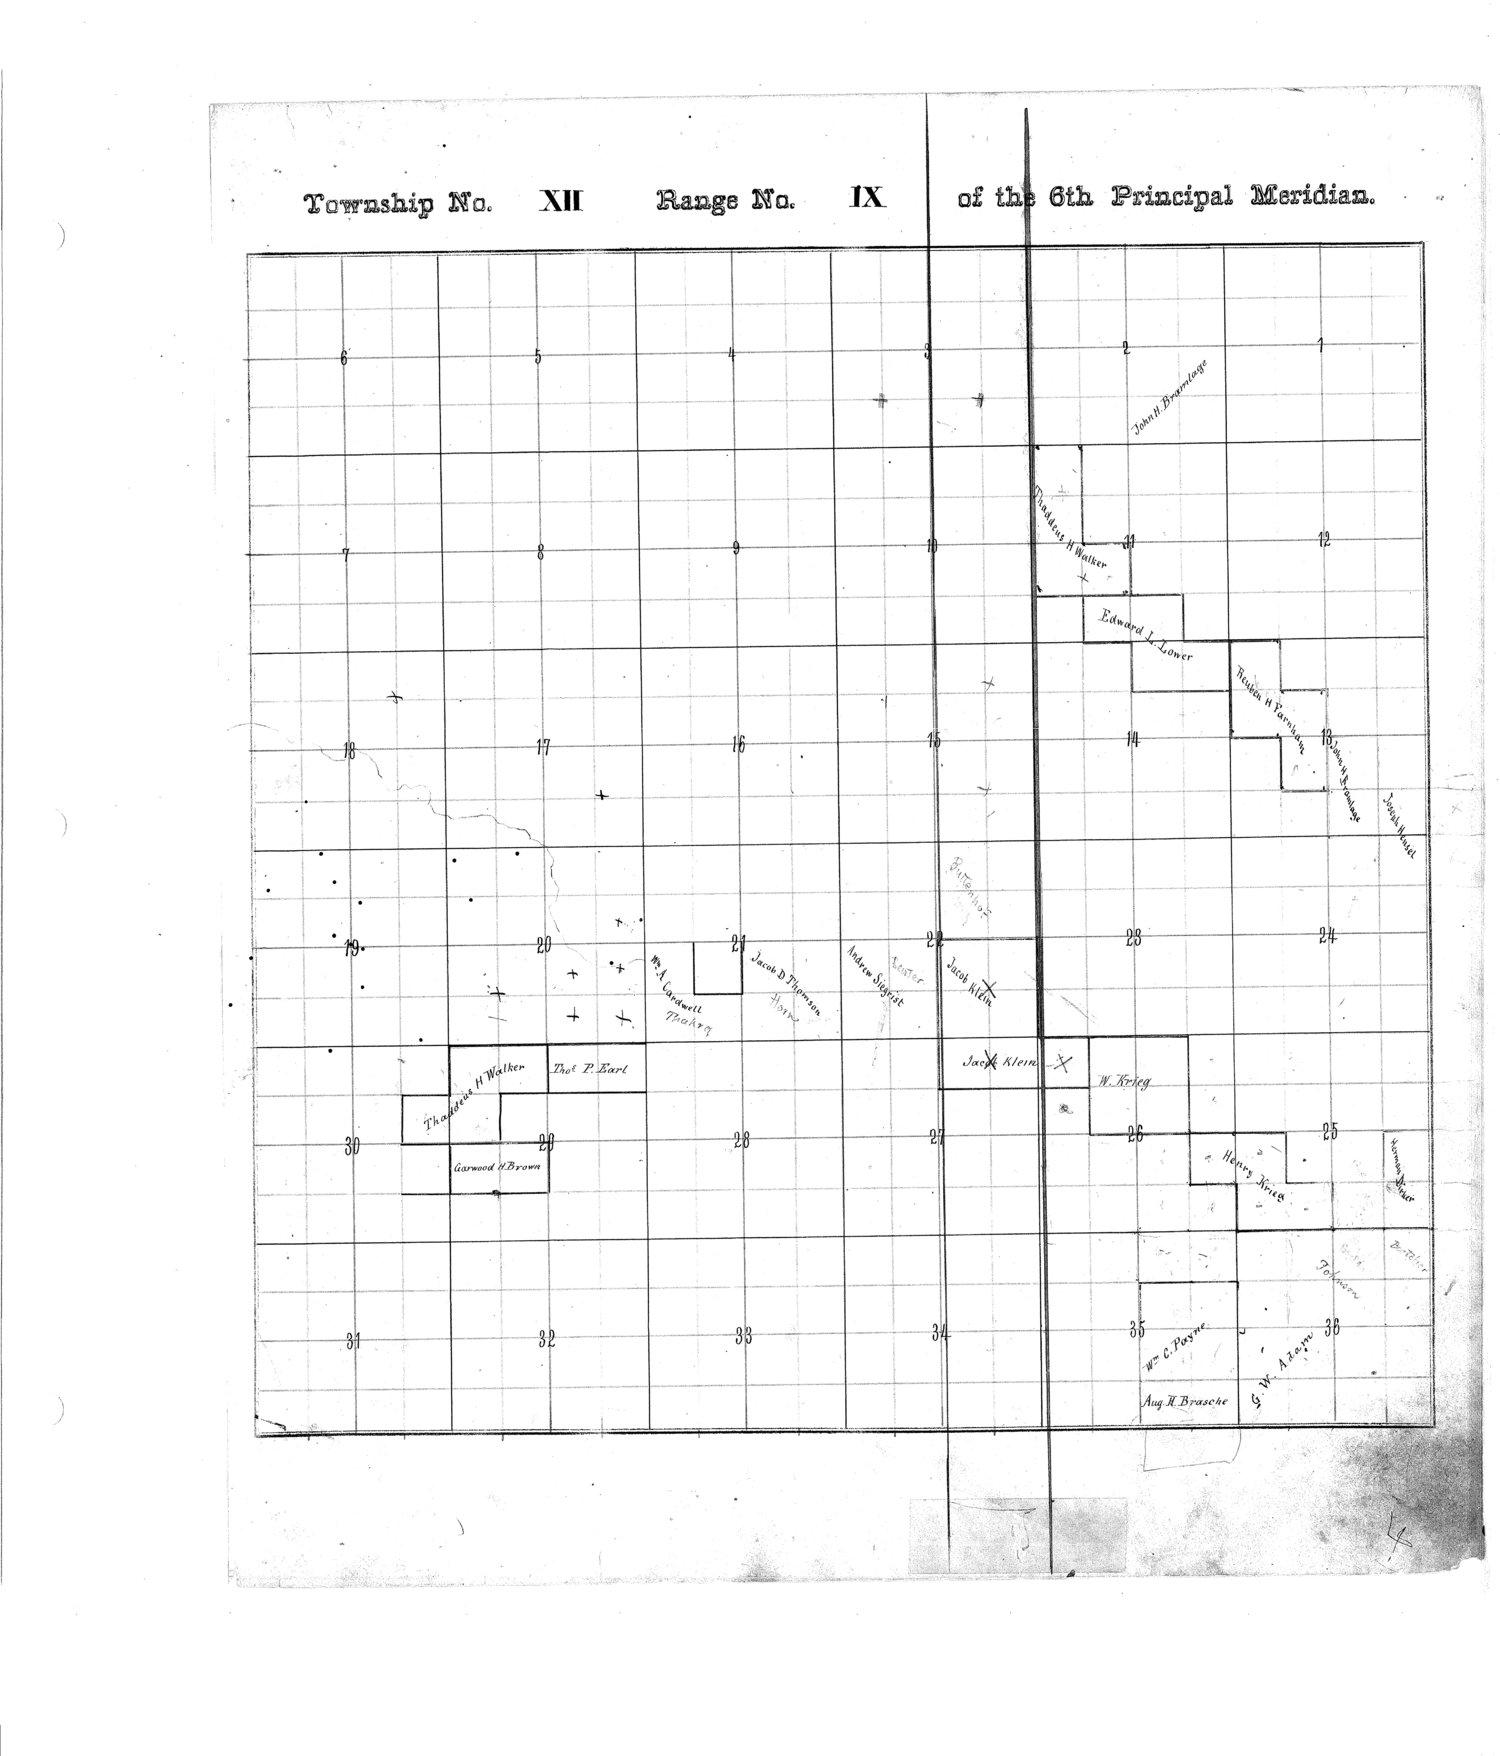 Richardson County and Wabaunsee County, Kansas, survey - 8